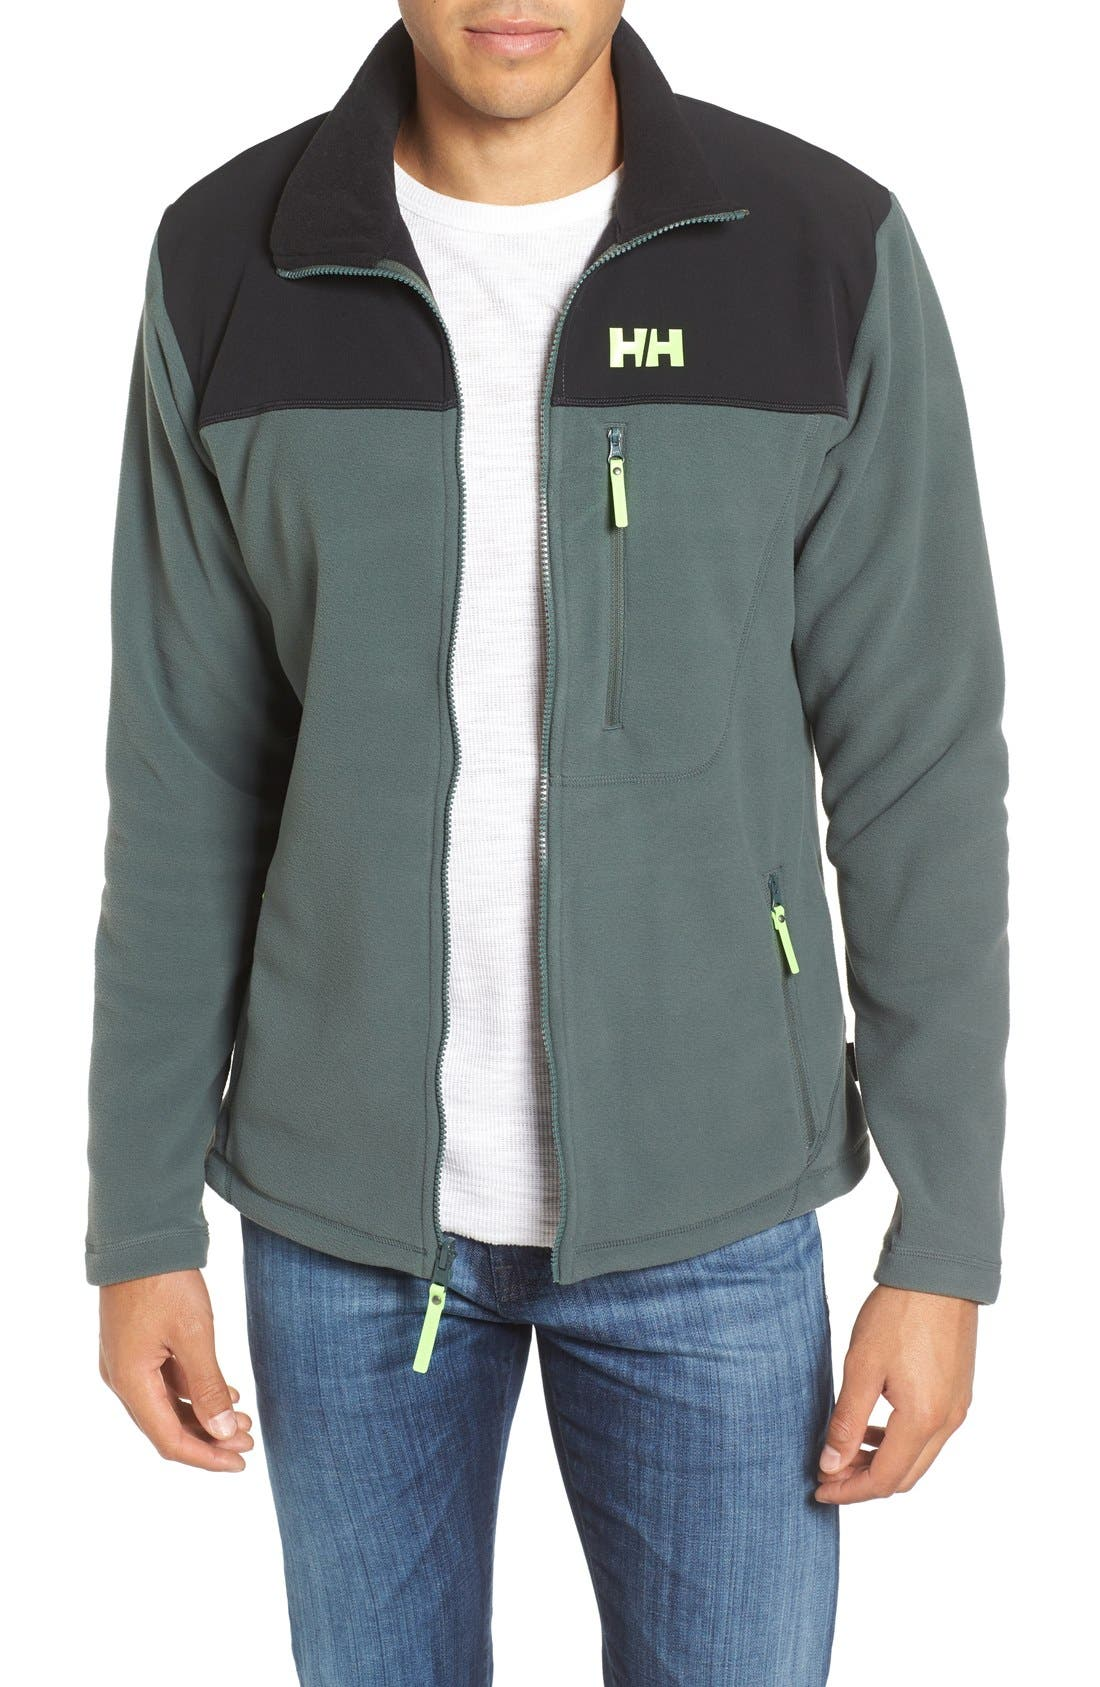 Alternate Image 1 Selected - Helly Hansen Sitka Fleece Jacket